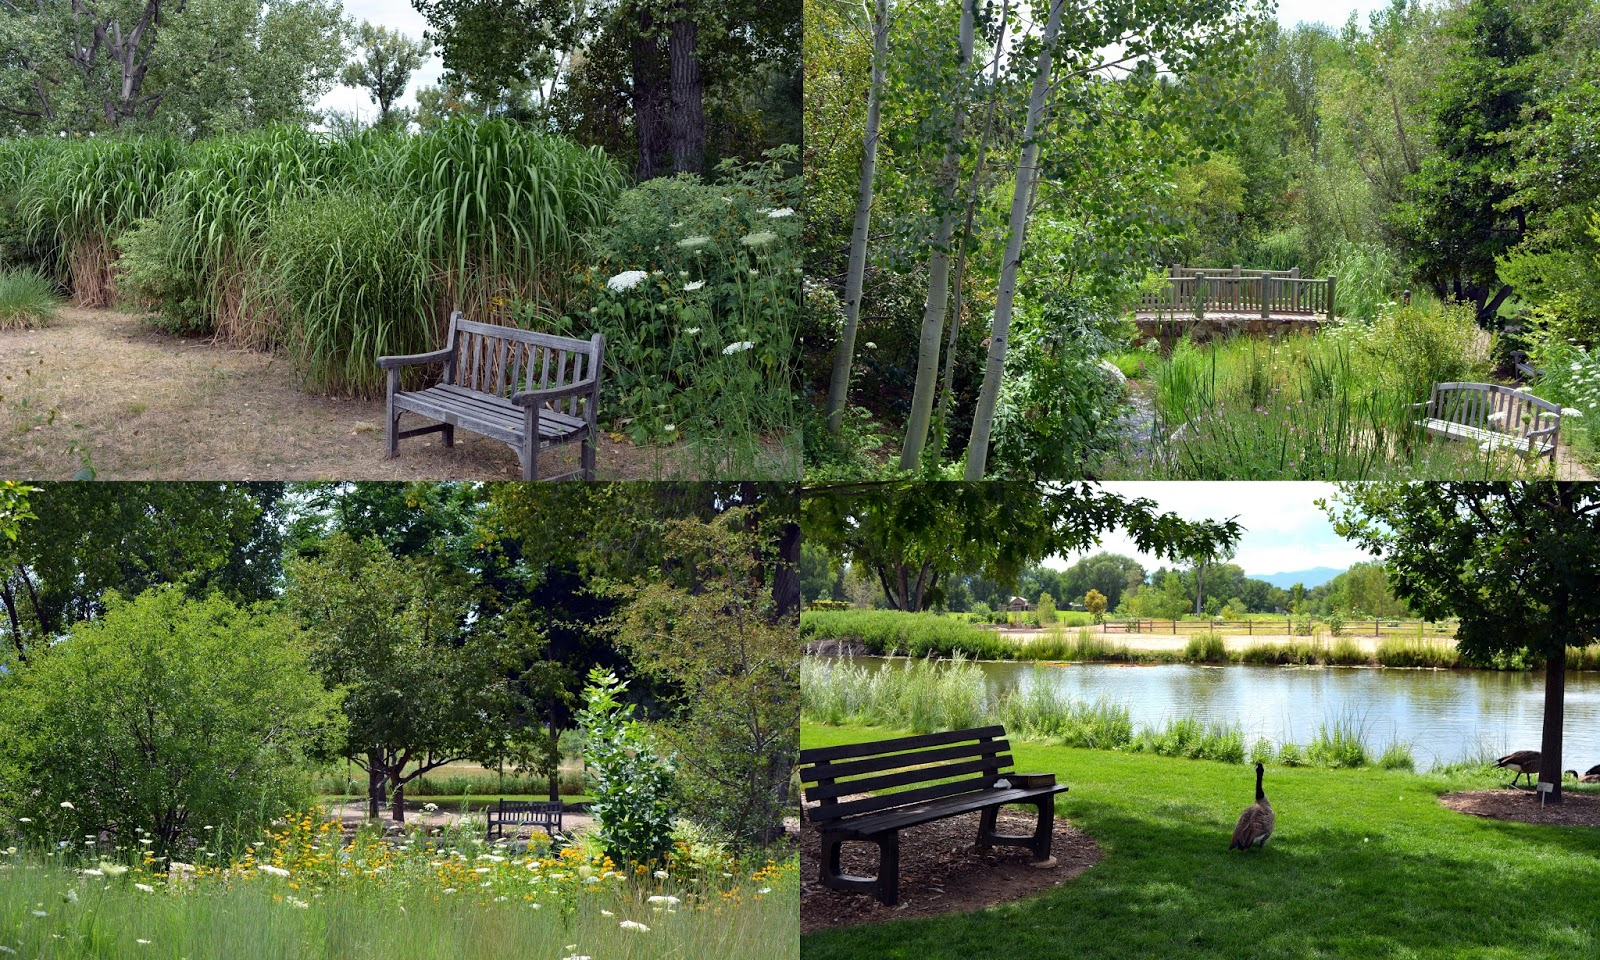 Mille Fiori Favoriti Hudson Gardens And Event Center In Littleton Co